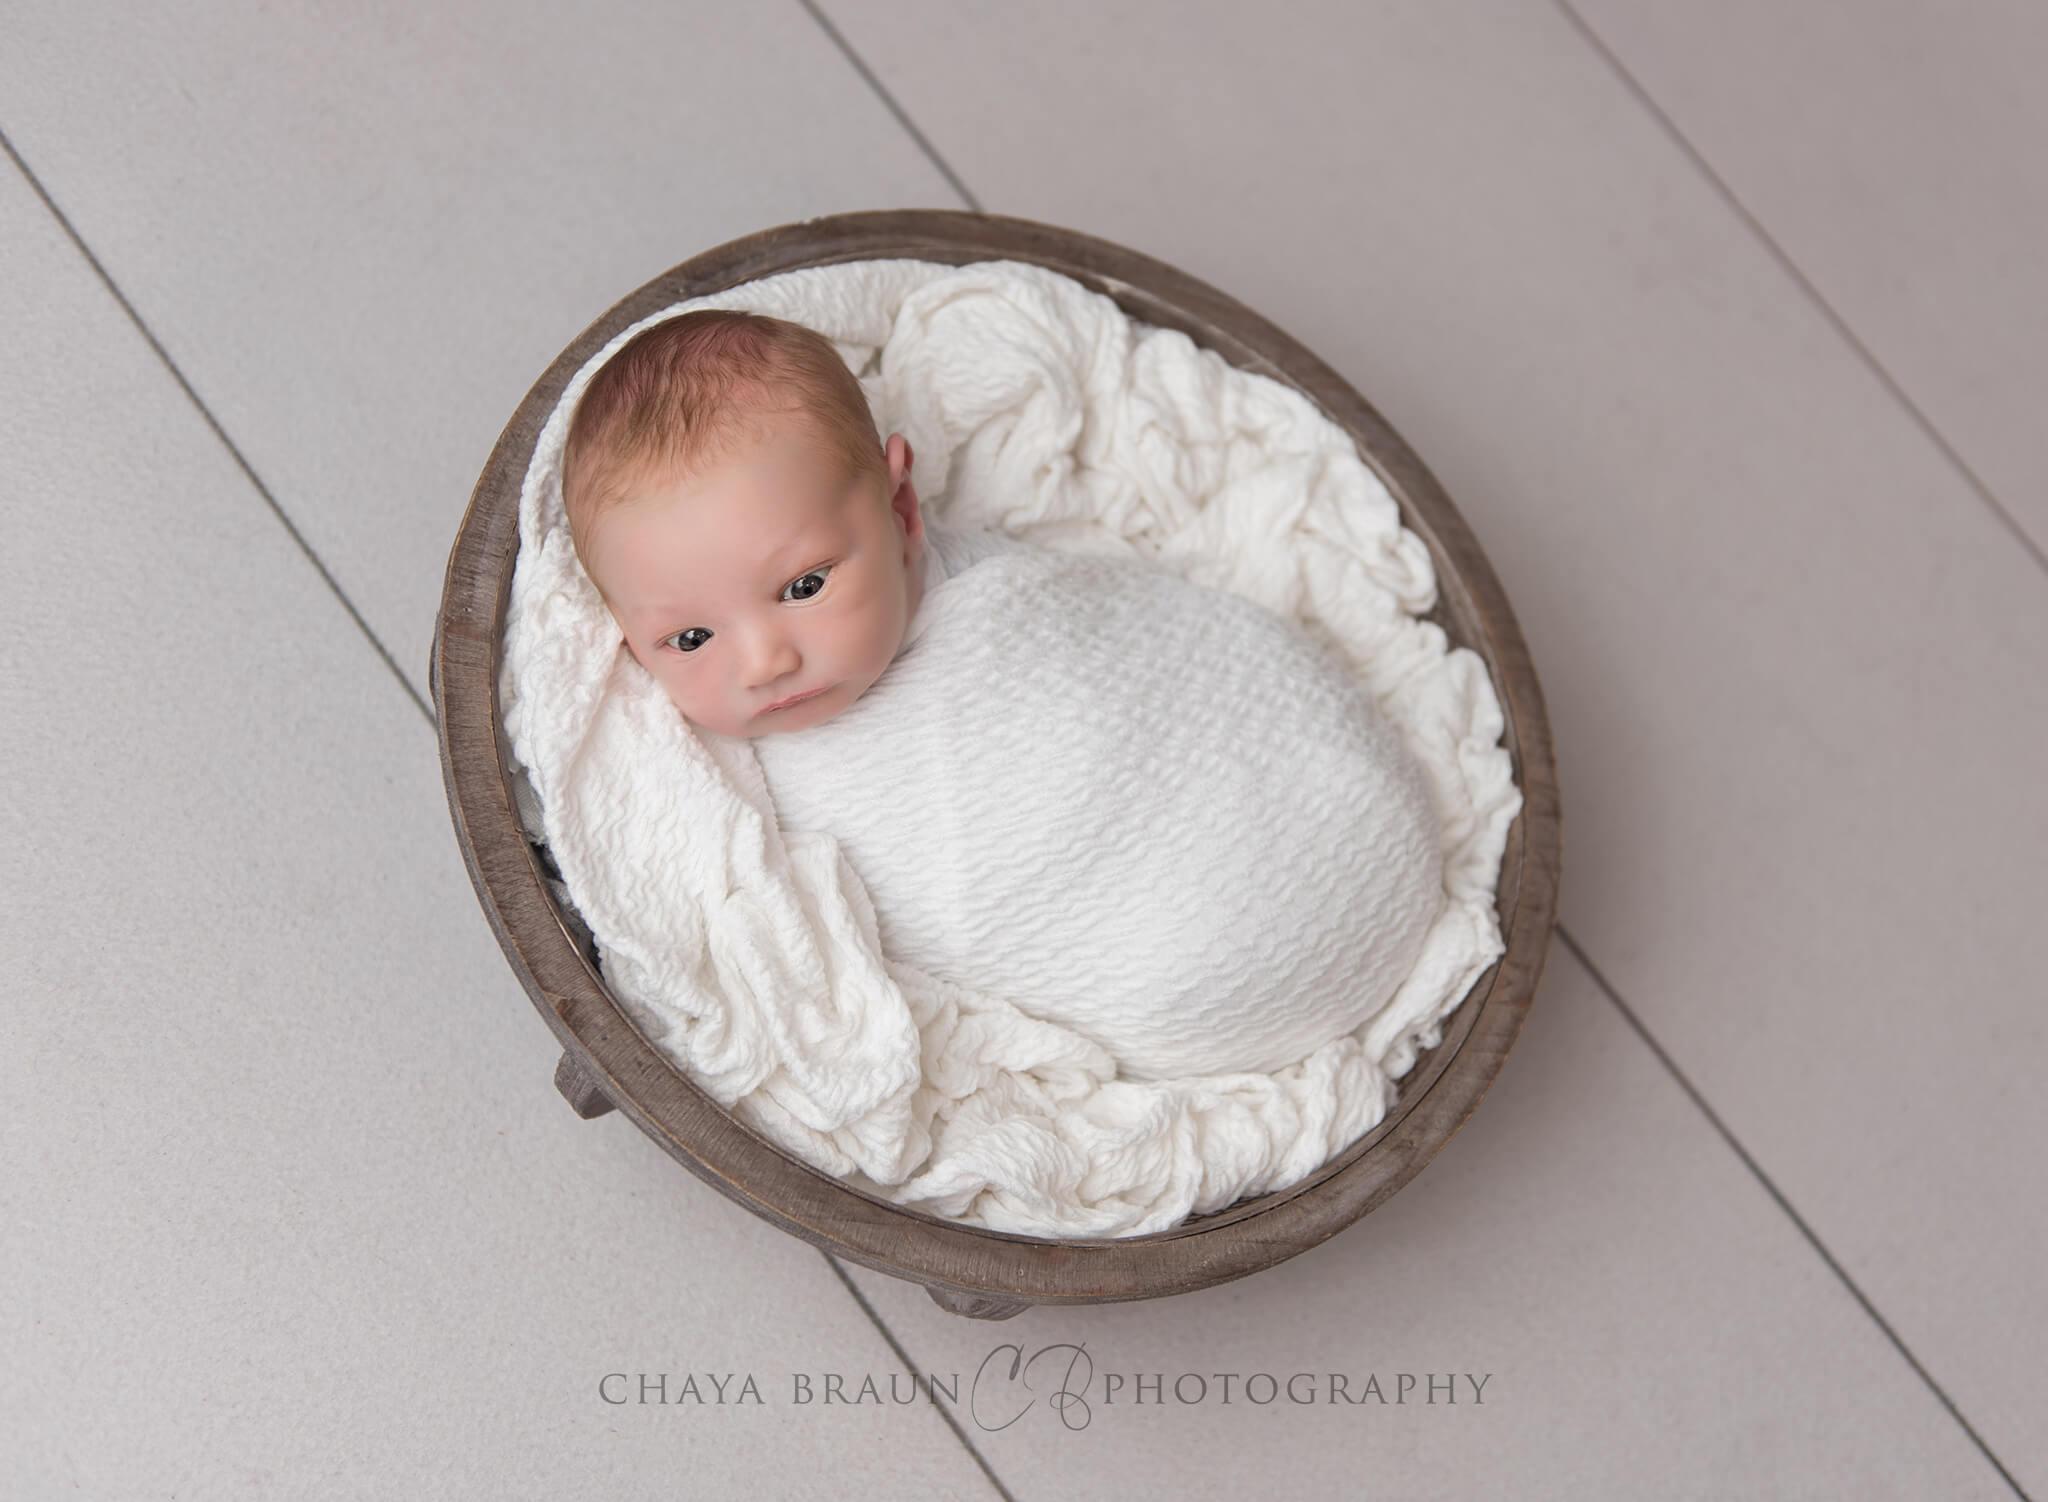 newborn baby in basket awake